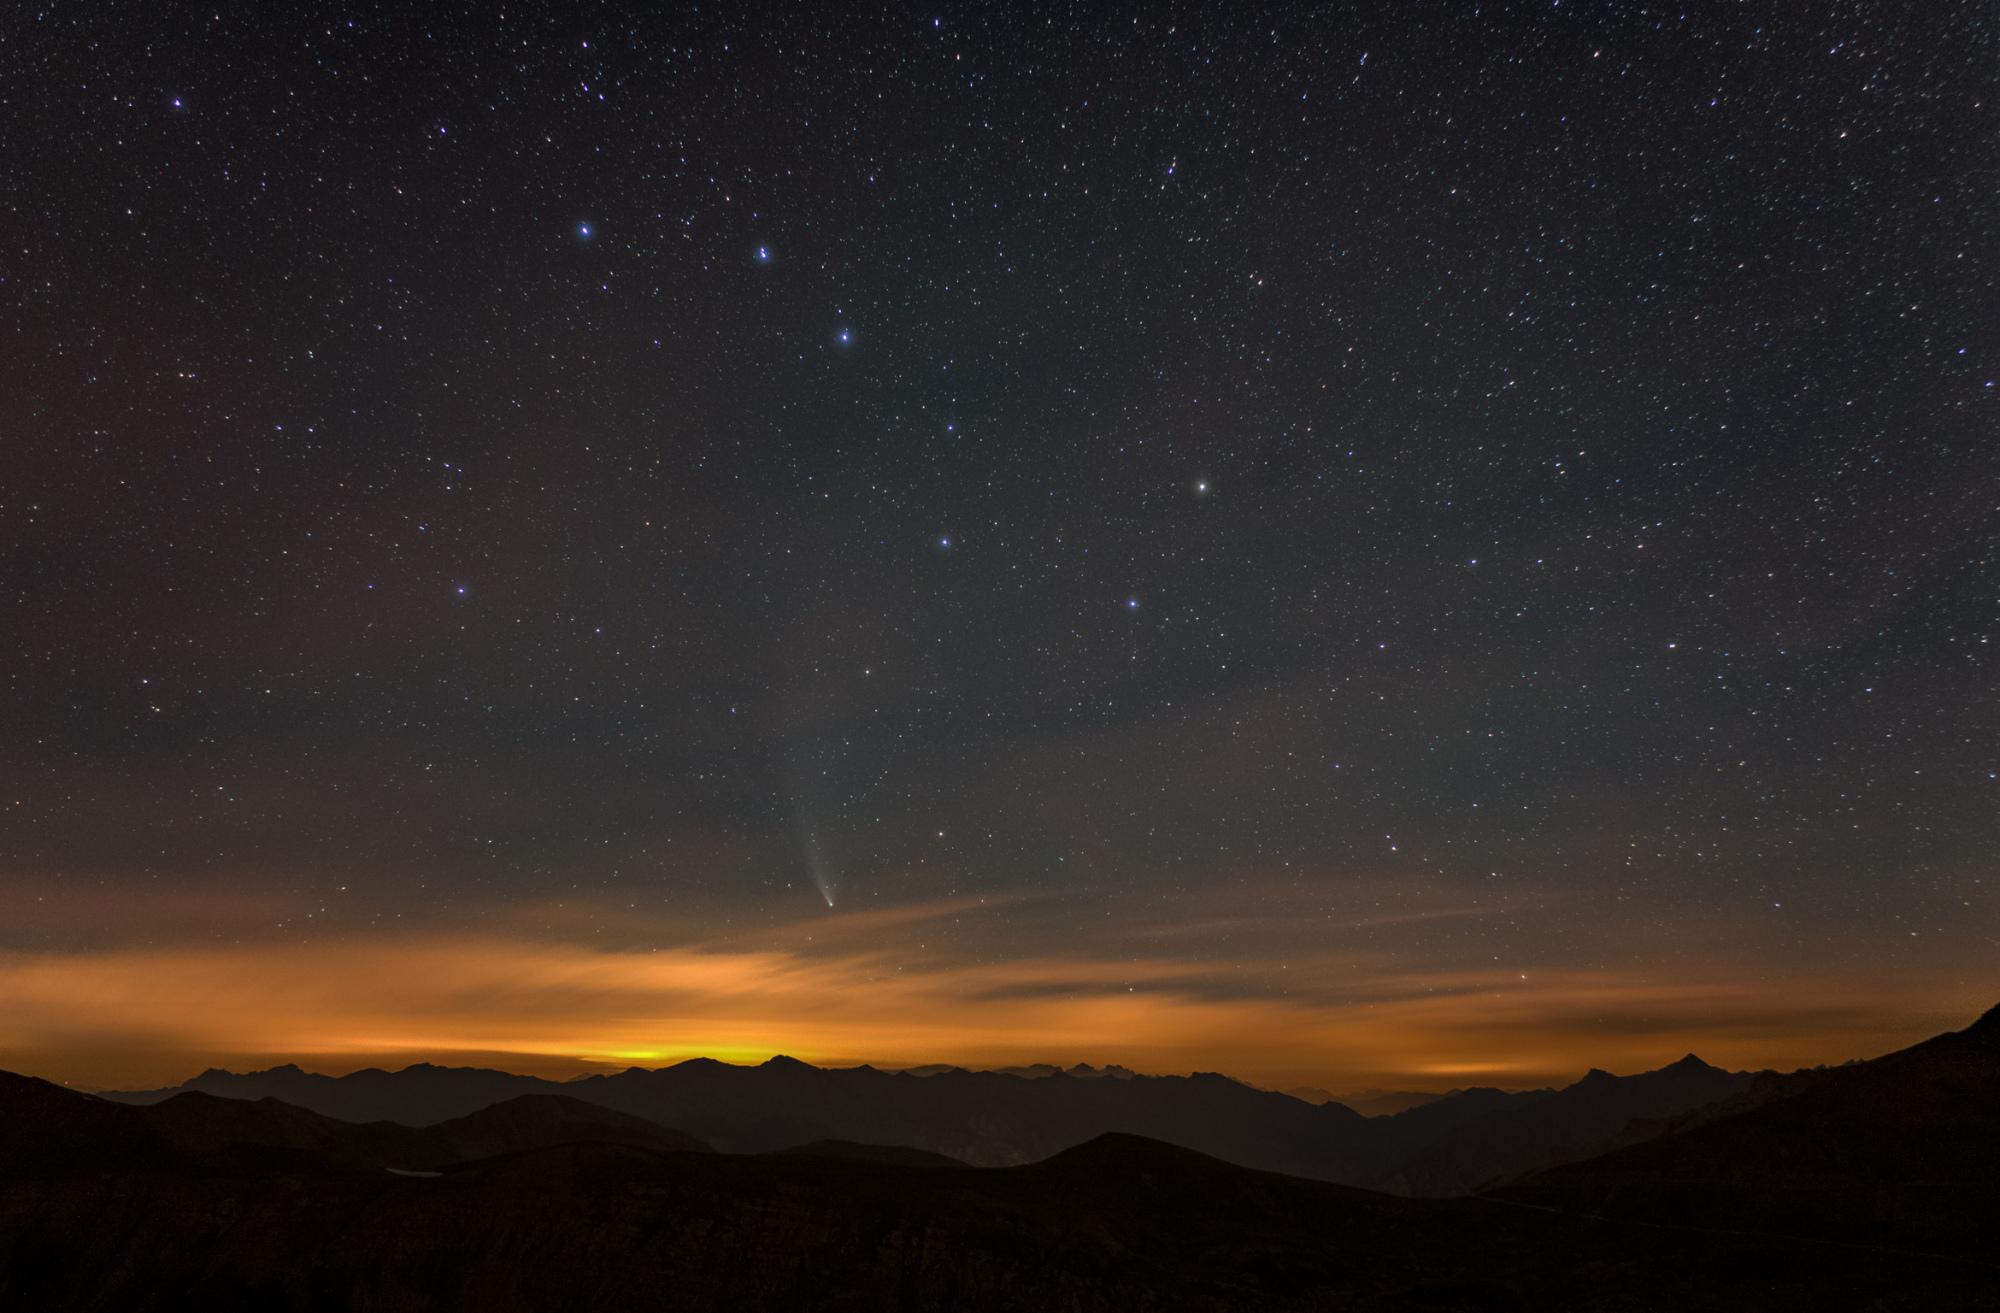 comete25_07_2020reduite.thumb.jpg.73345307fc2961d92a09311a84cb6258.jpg